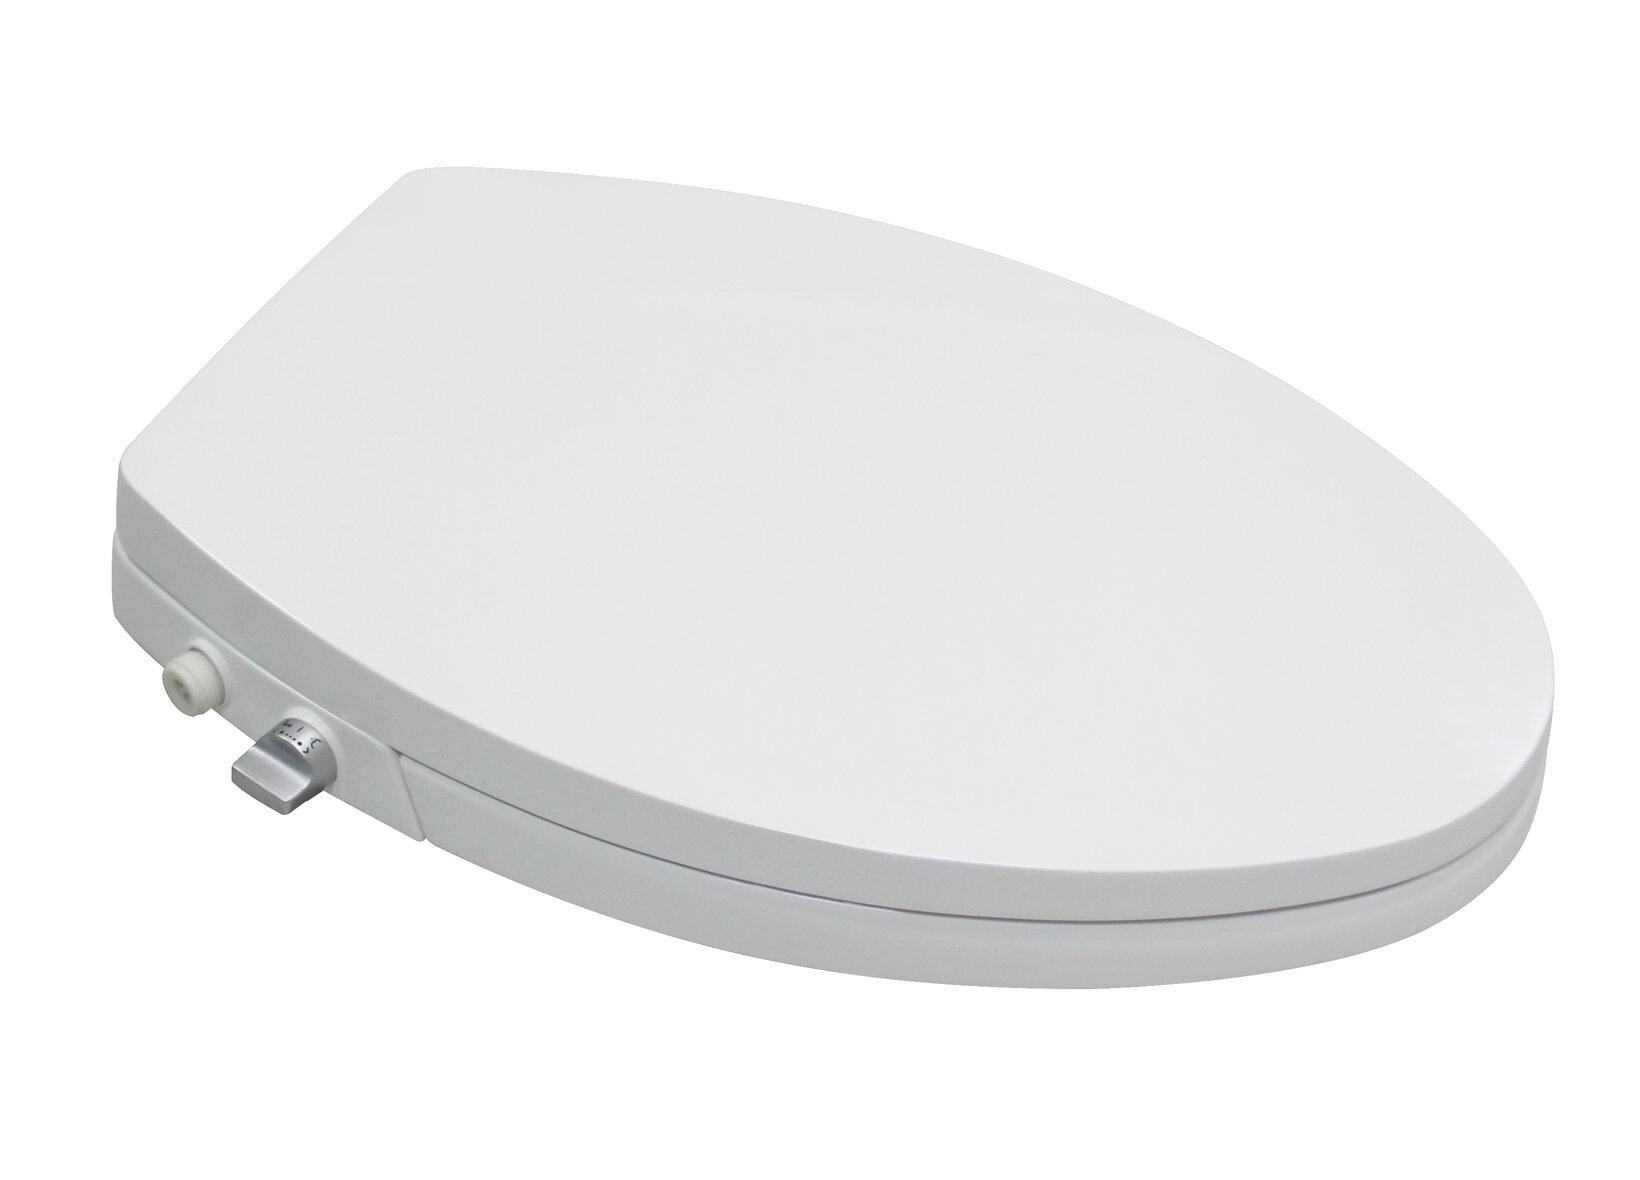 Terrific Dual Nozzles Elongated Toilet Seat Bidet Alphanode Cool Chair Designs And Ideas Alphanodeonline